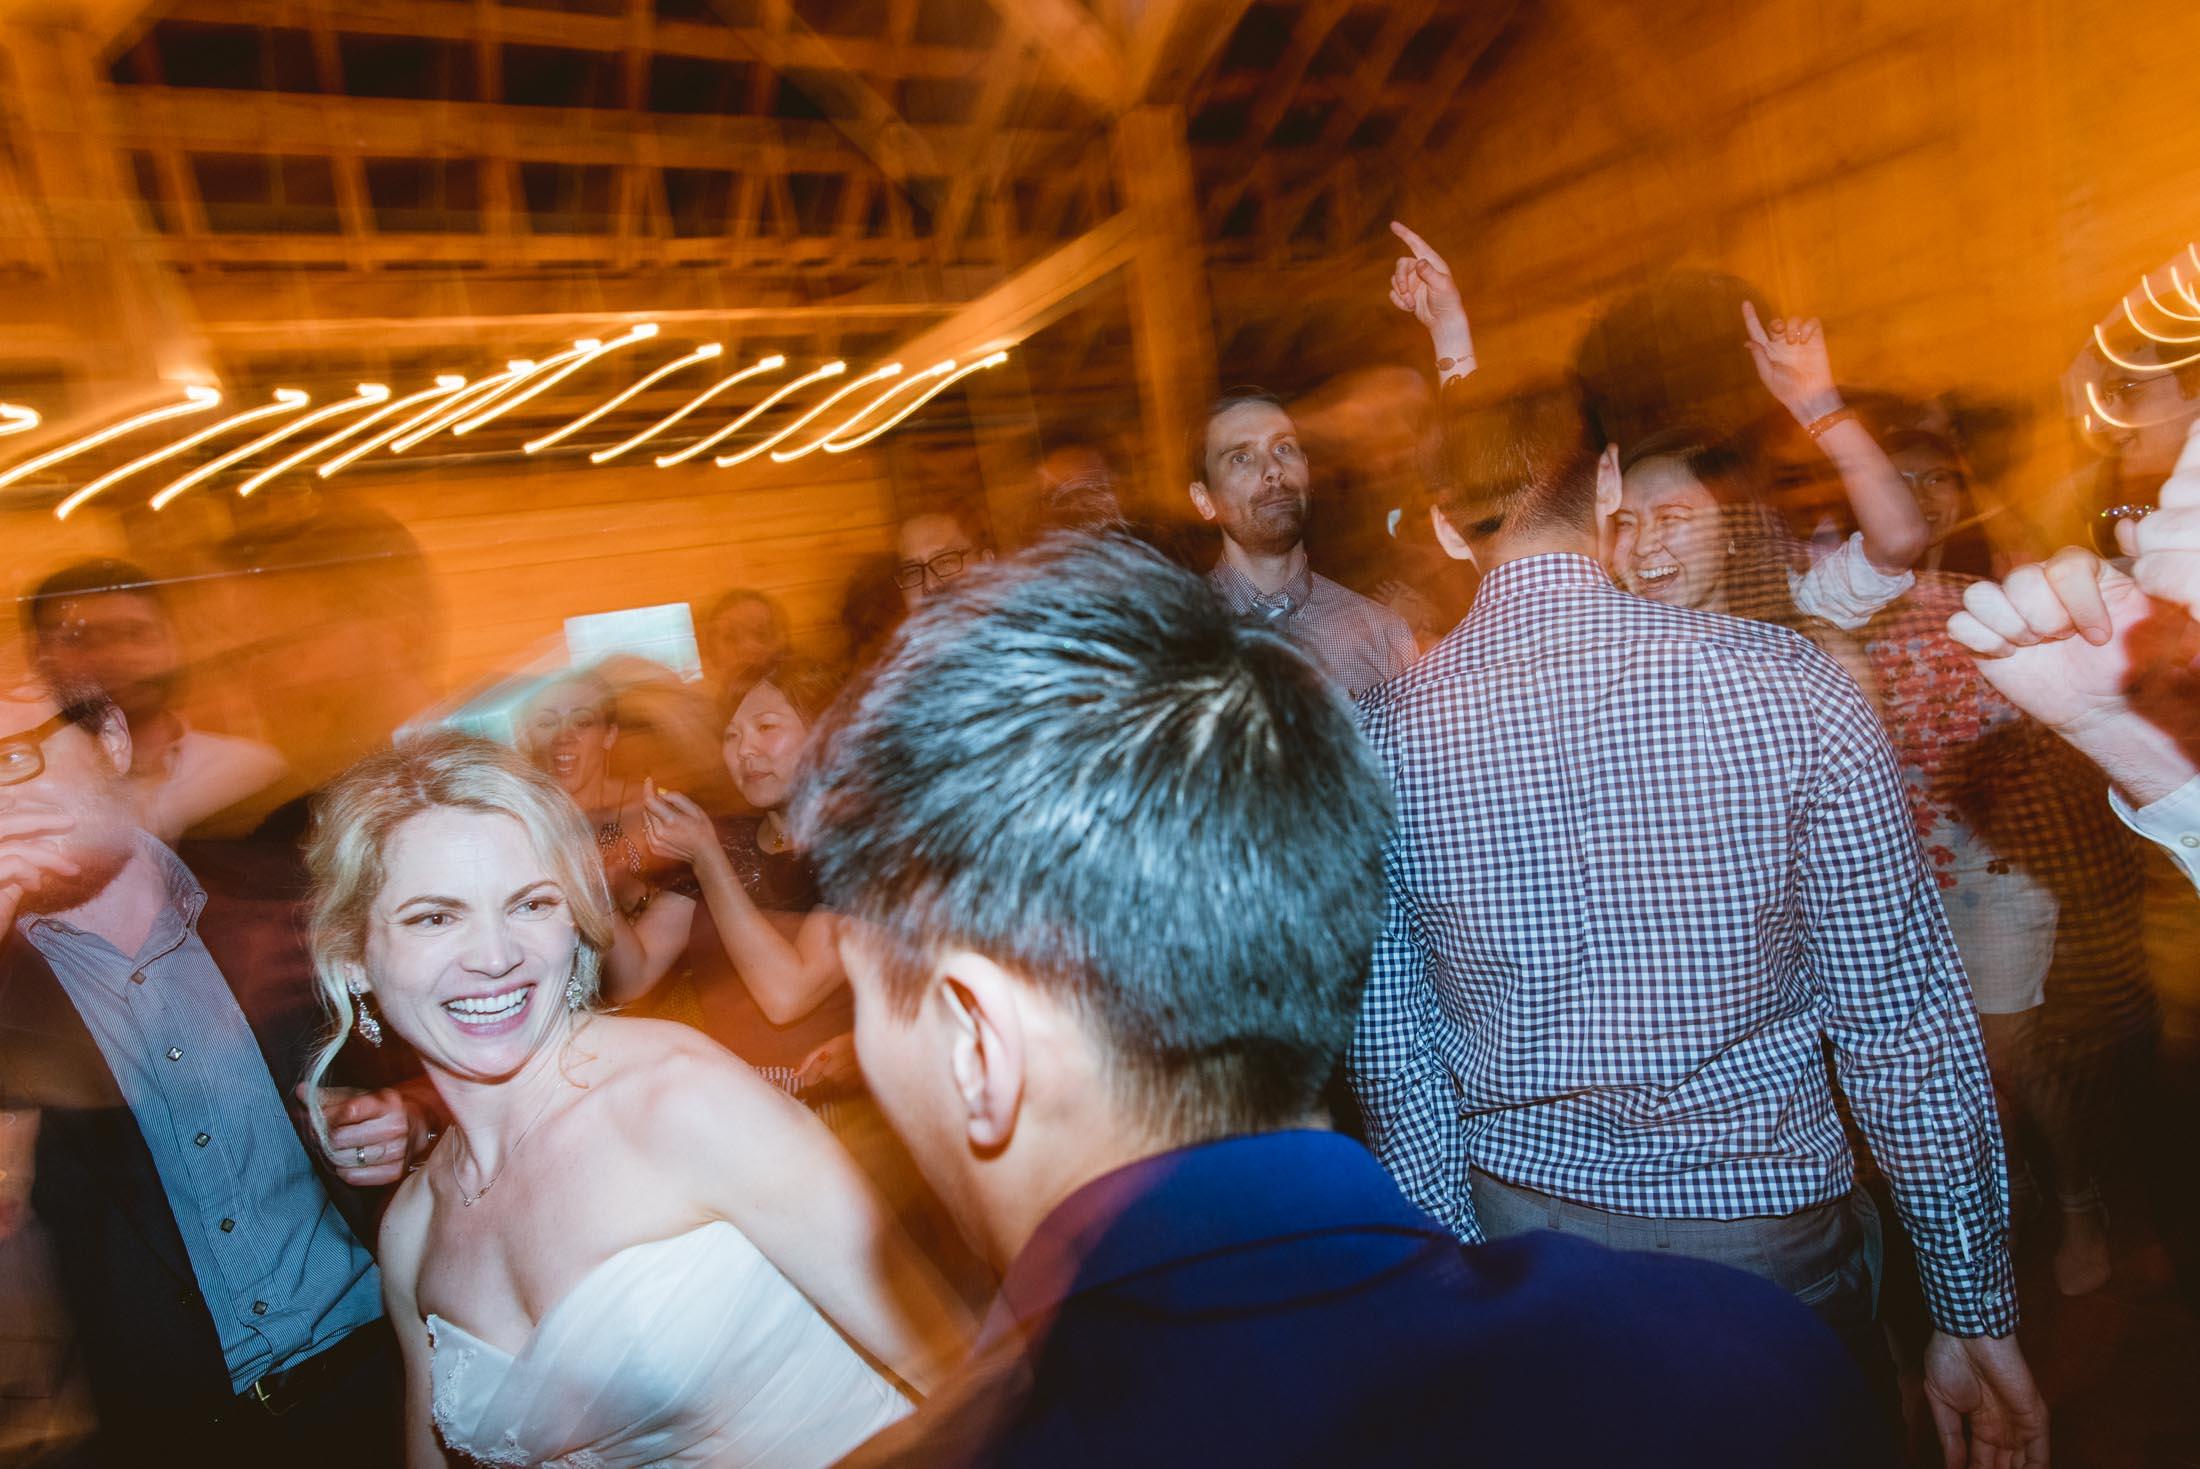 Blissful-Meadows-wedding-31.jpg